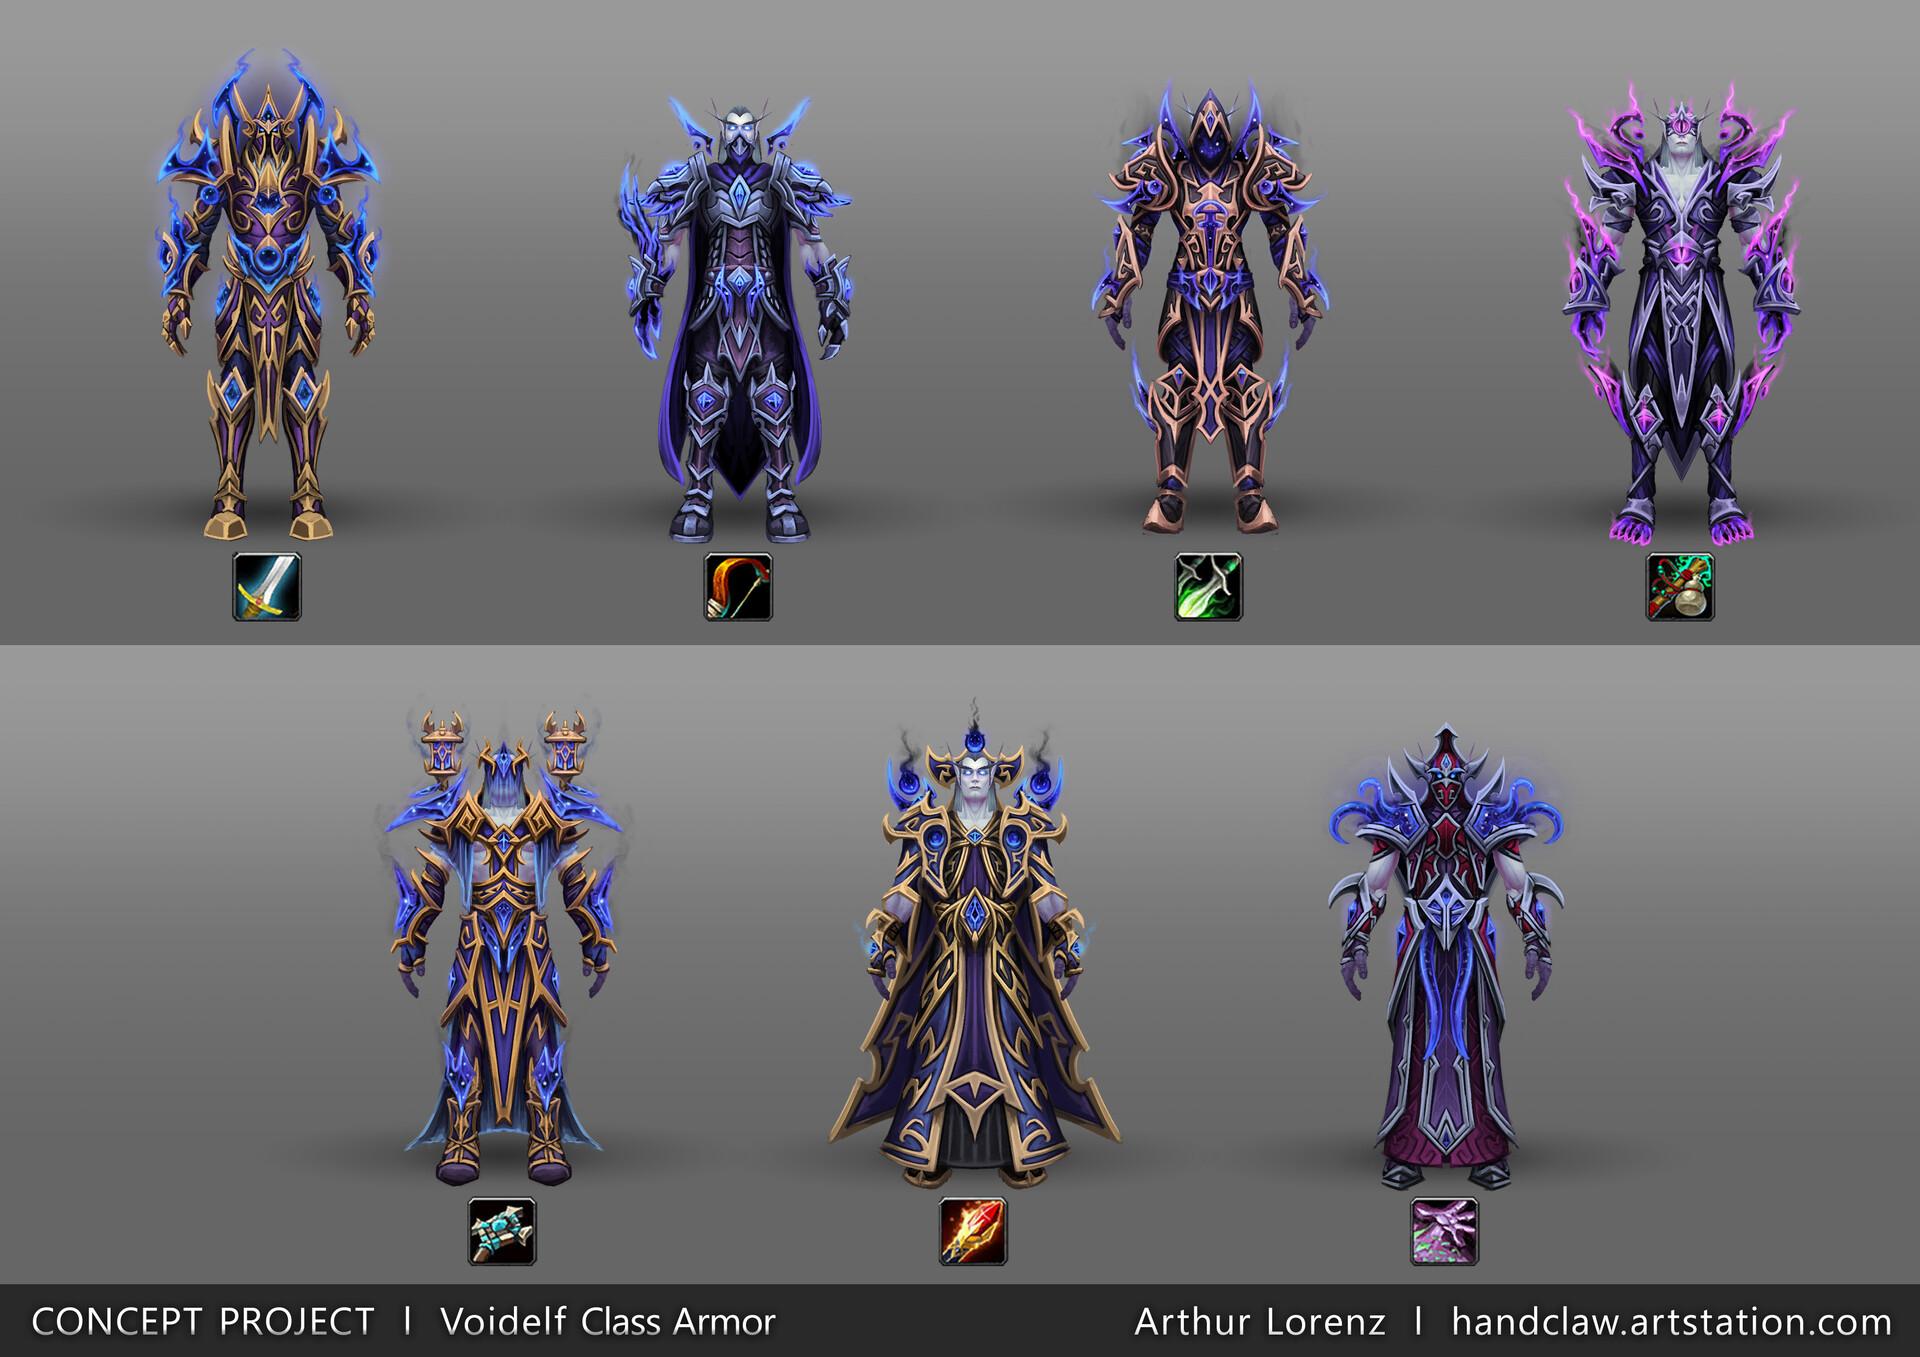 Artstation Fan Art World Of Warcraft Racial Class Armor Design Voidelf Arthur Lorenz And since i'm on the subject of transmog, i feel bad for the nightborne, highmountain tauren, void elf, and lightforged draenei. of warcraft racial class armor design